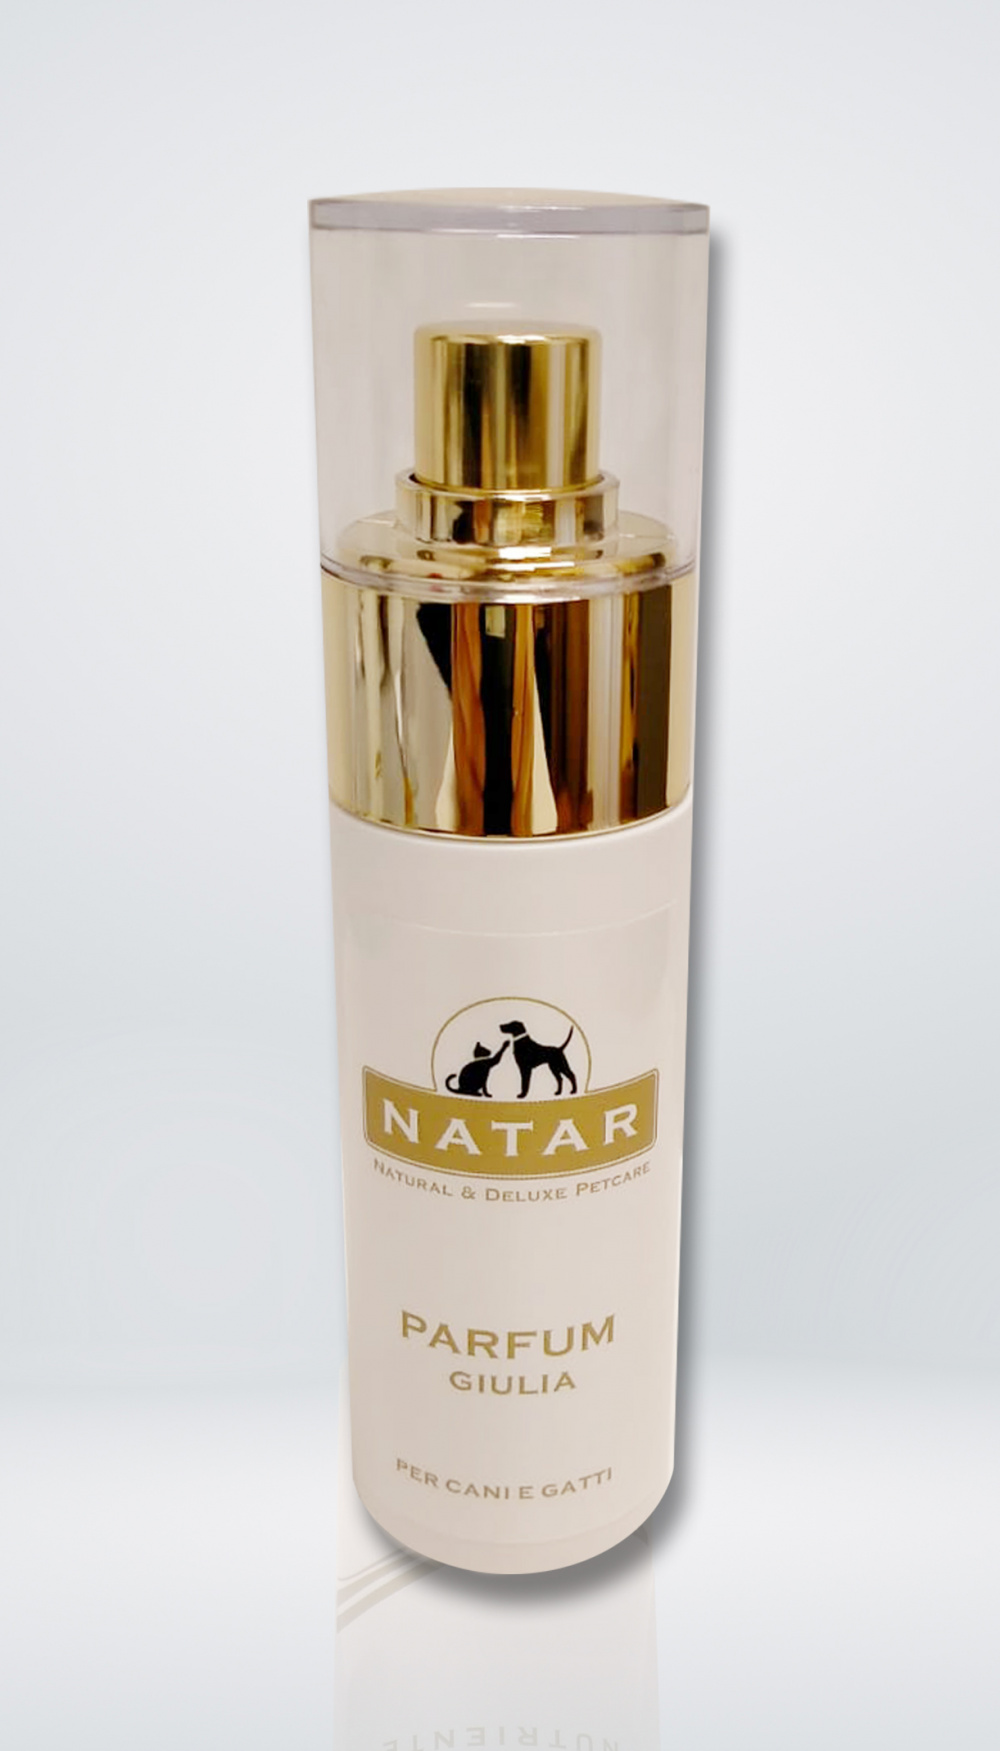 Natar Parfum Giulia